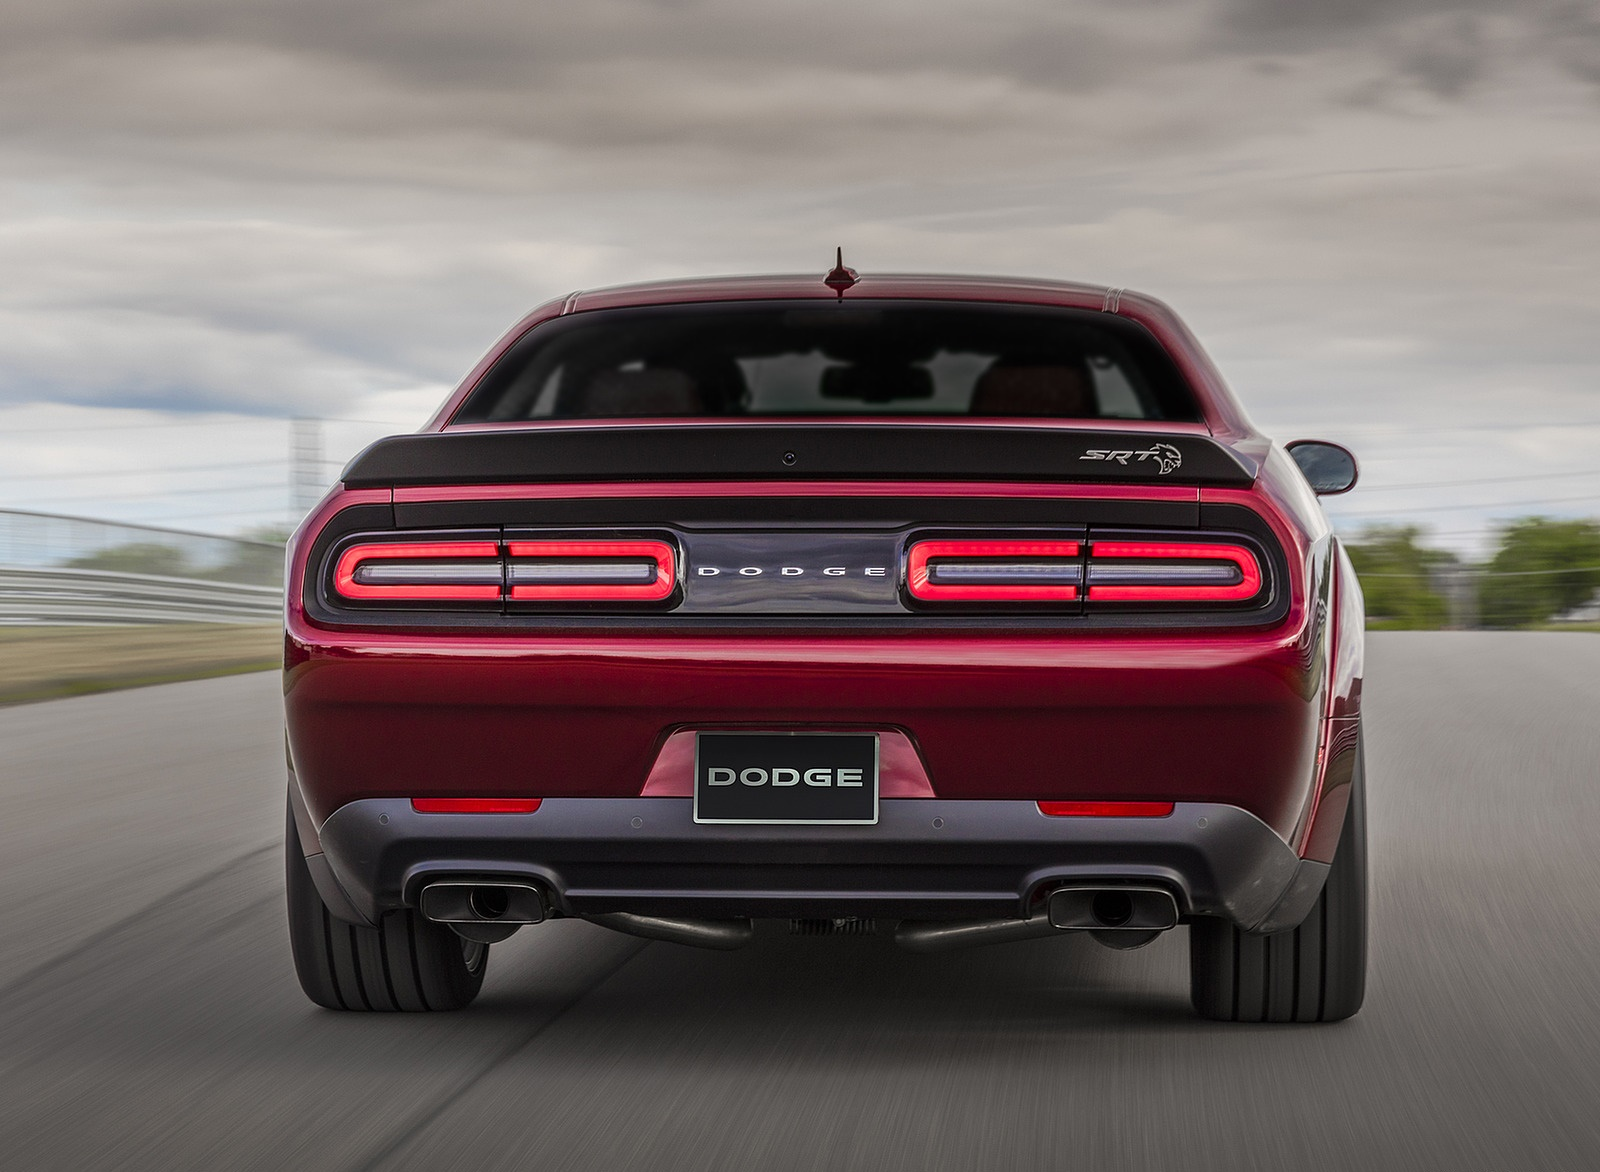 2018 Dodge Challenger SRT Hellcat Widebody Rear Wallpaper (15)